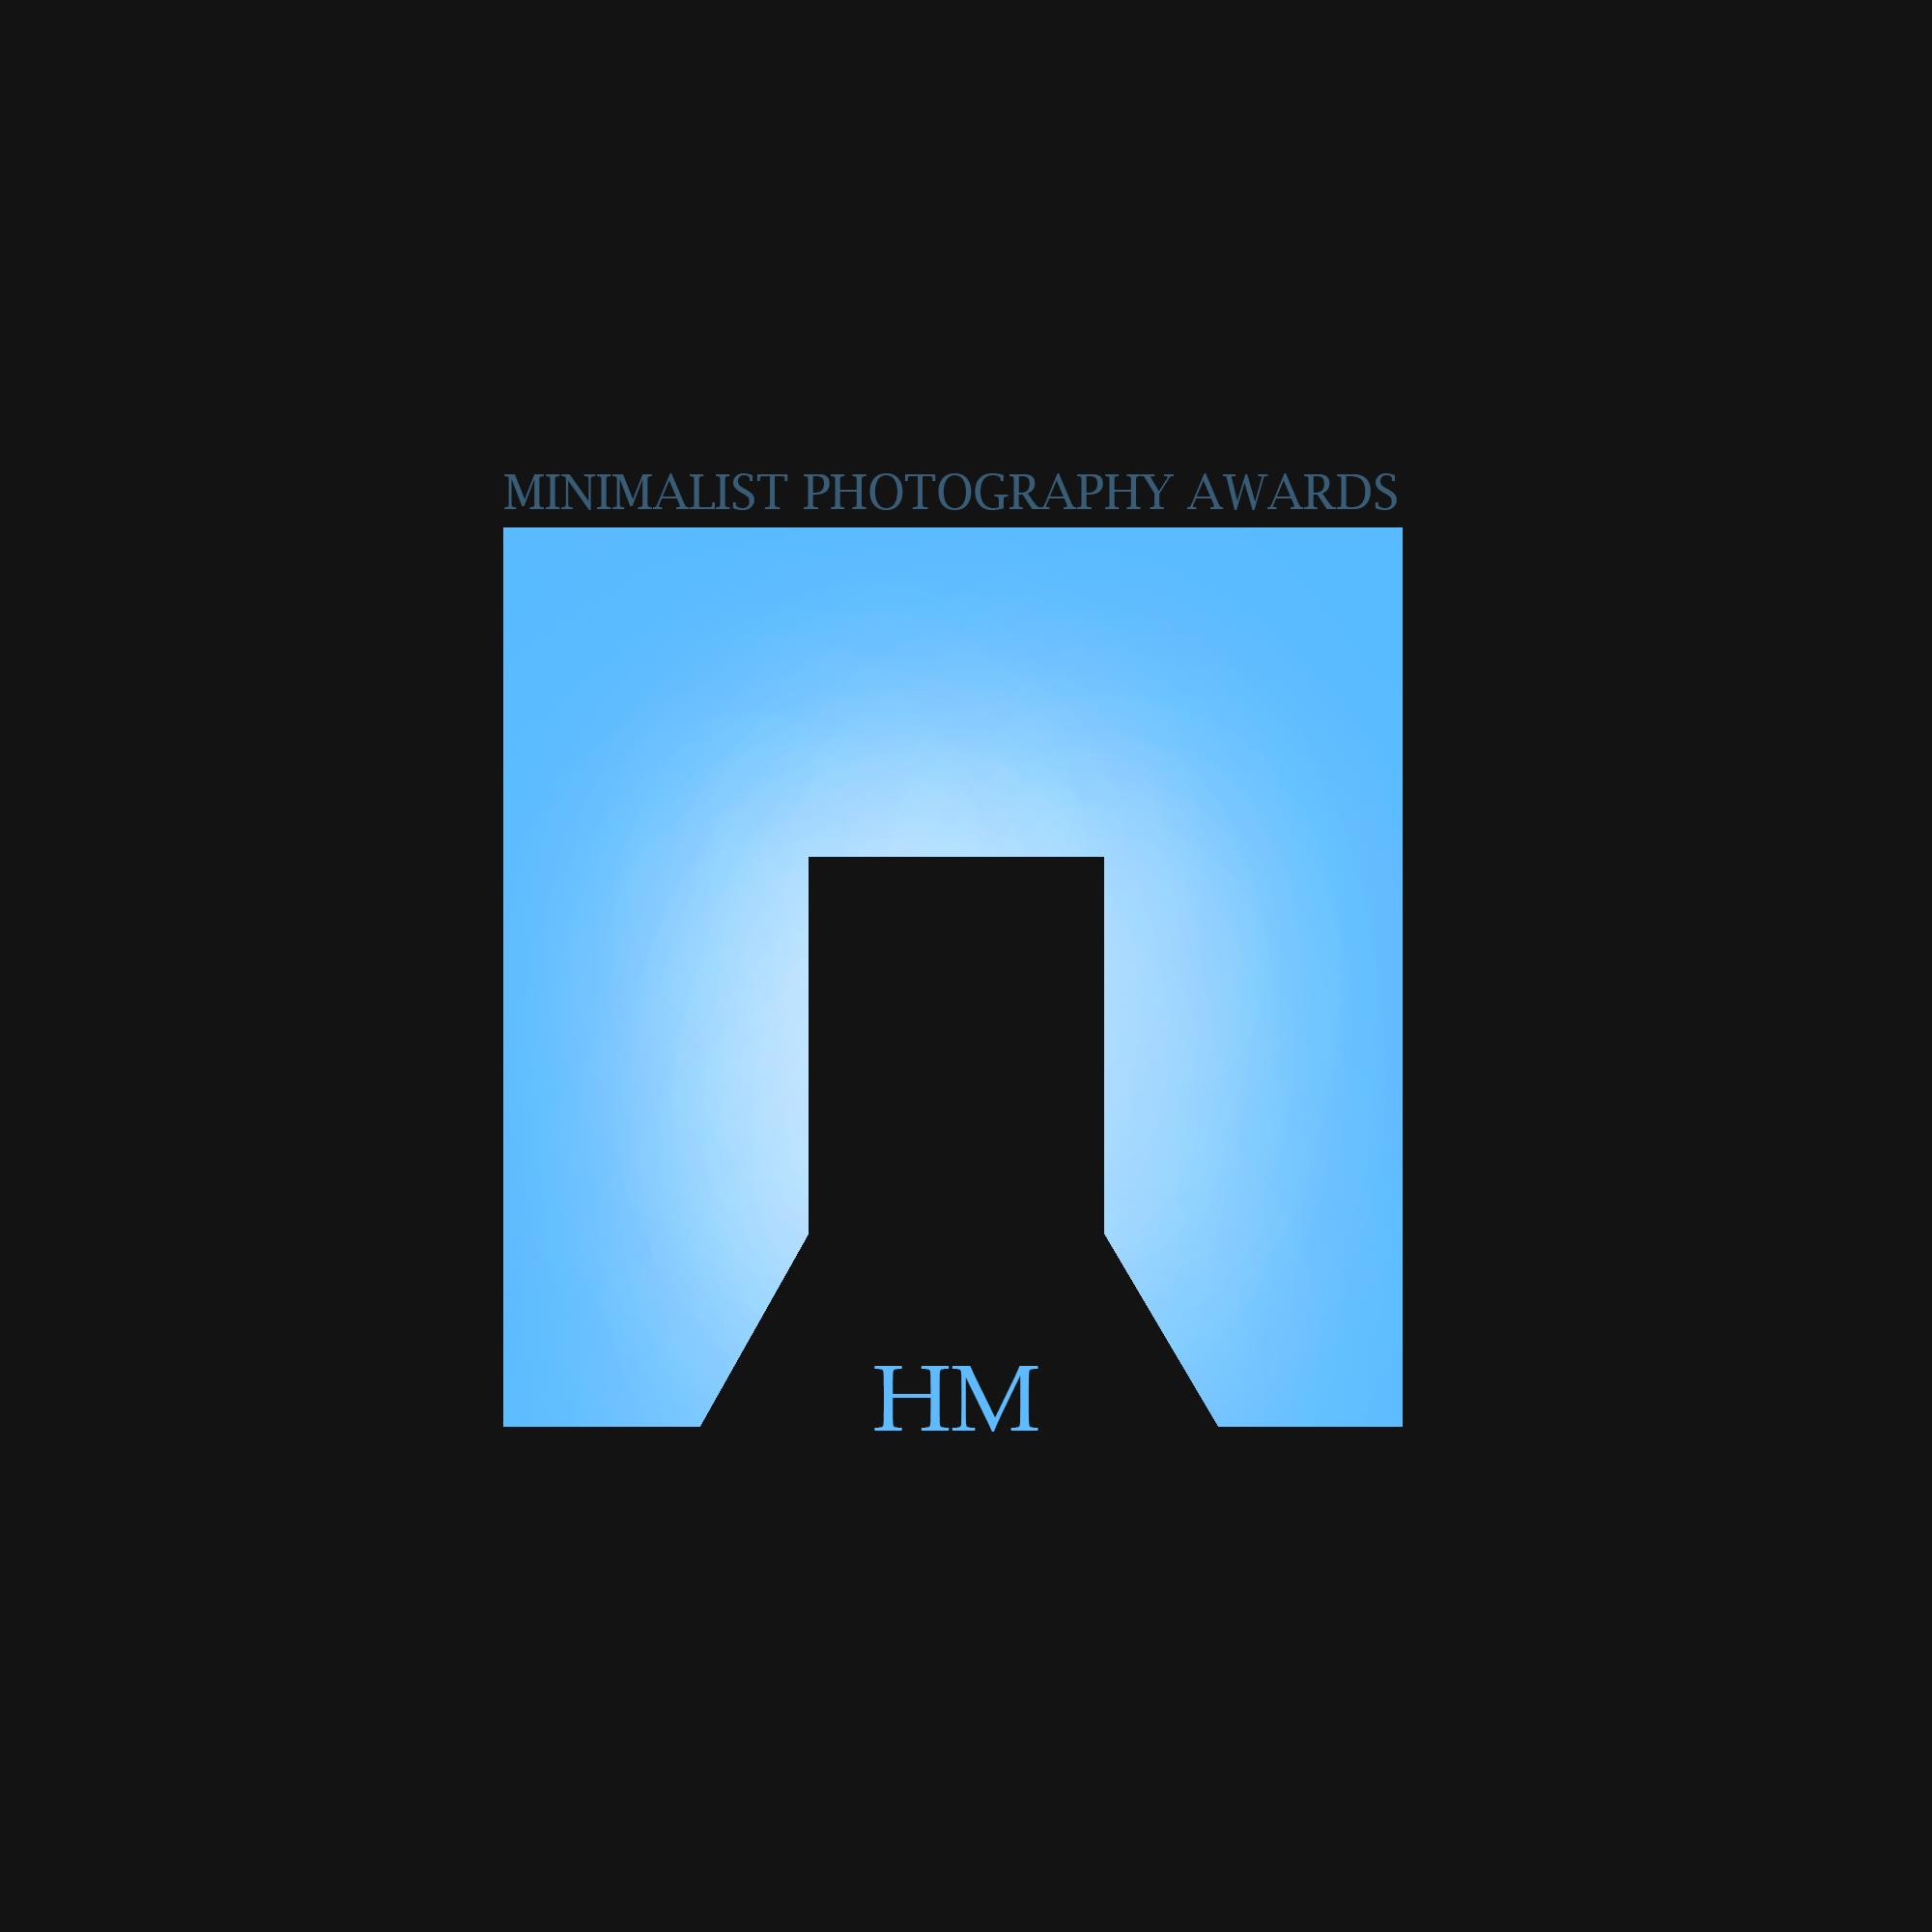 HM EXTRA 2